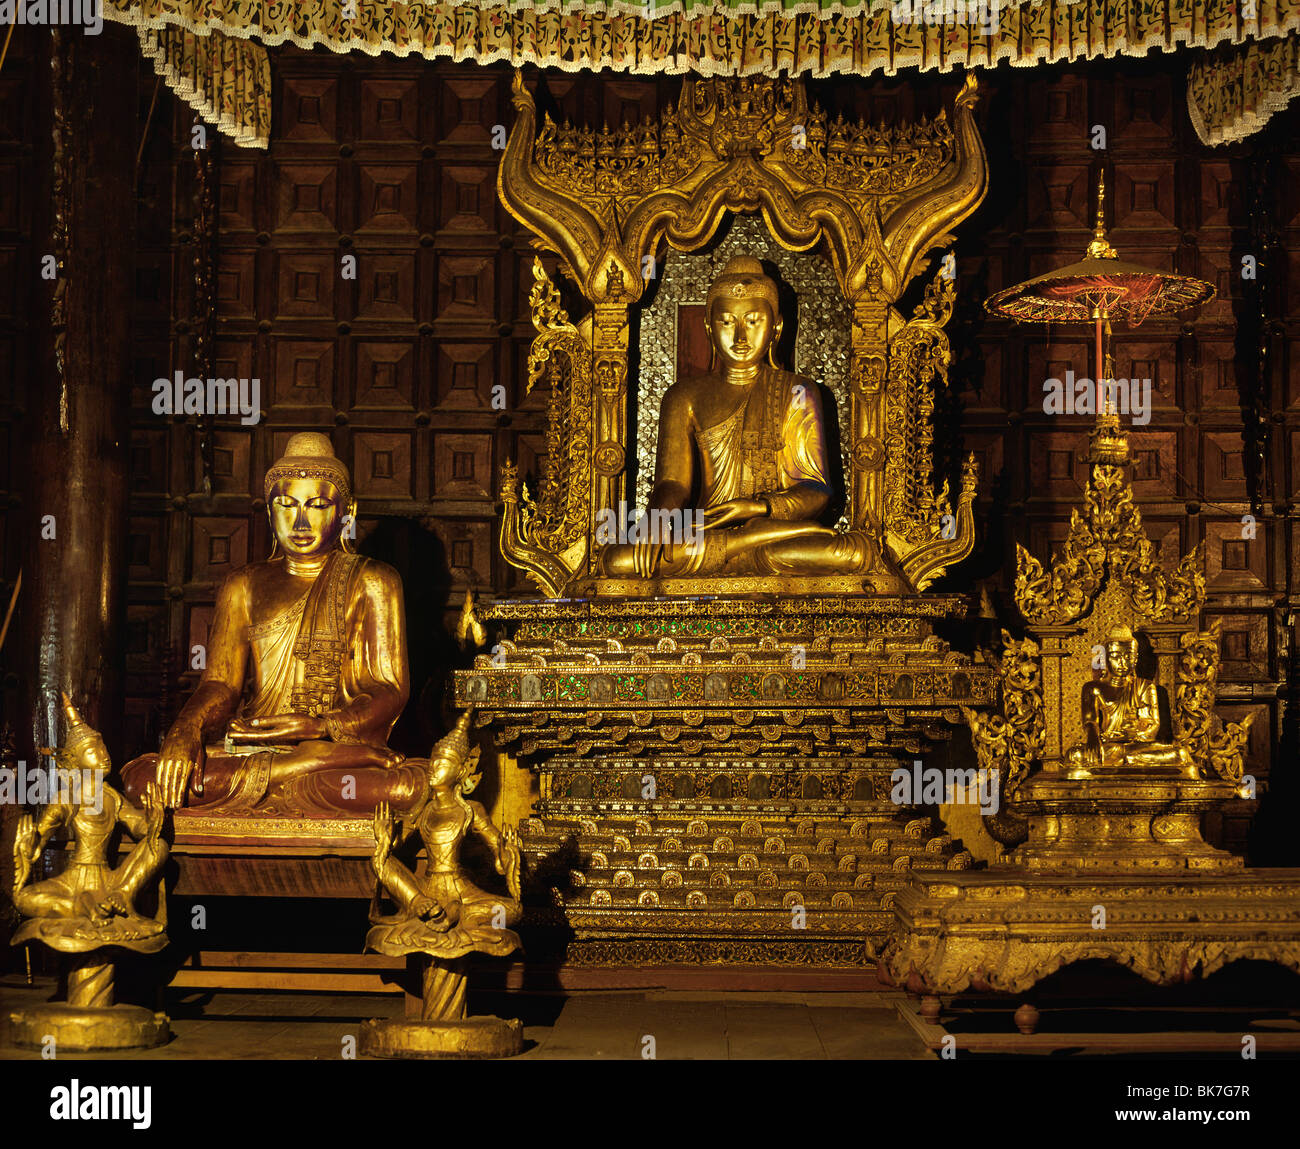 Buddha Images from late Mandalay period in the Shwe In Bin Monastery, Mandalay, Myanmar (Burma), Asia - Stock Image